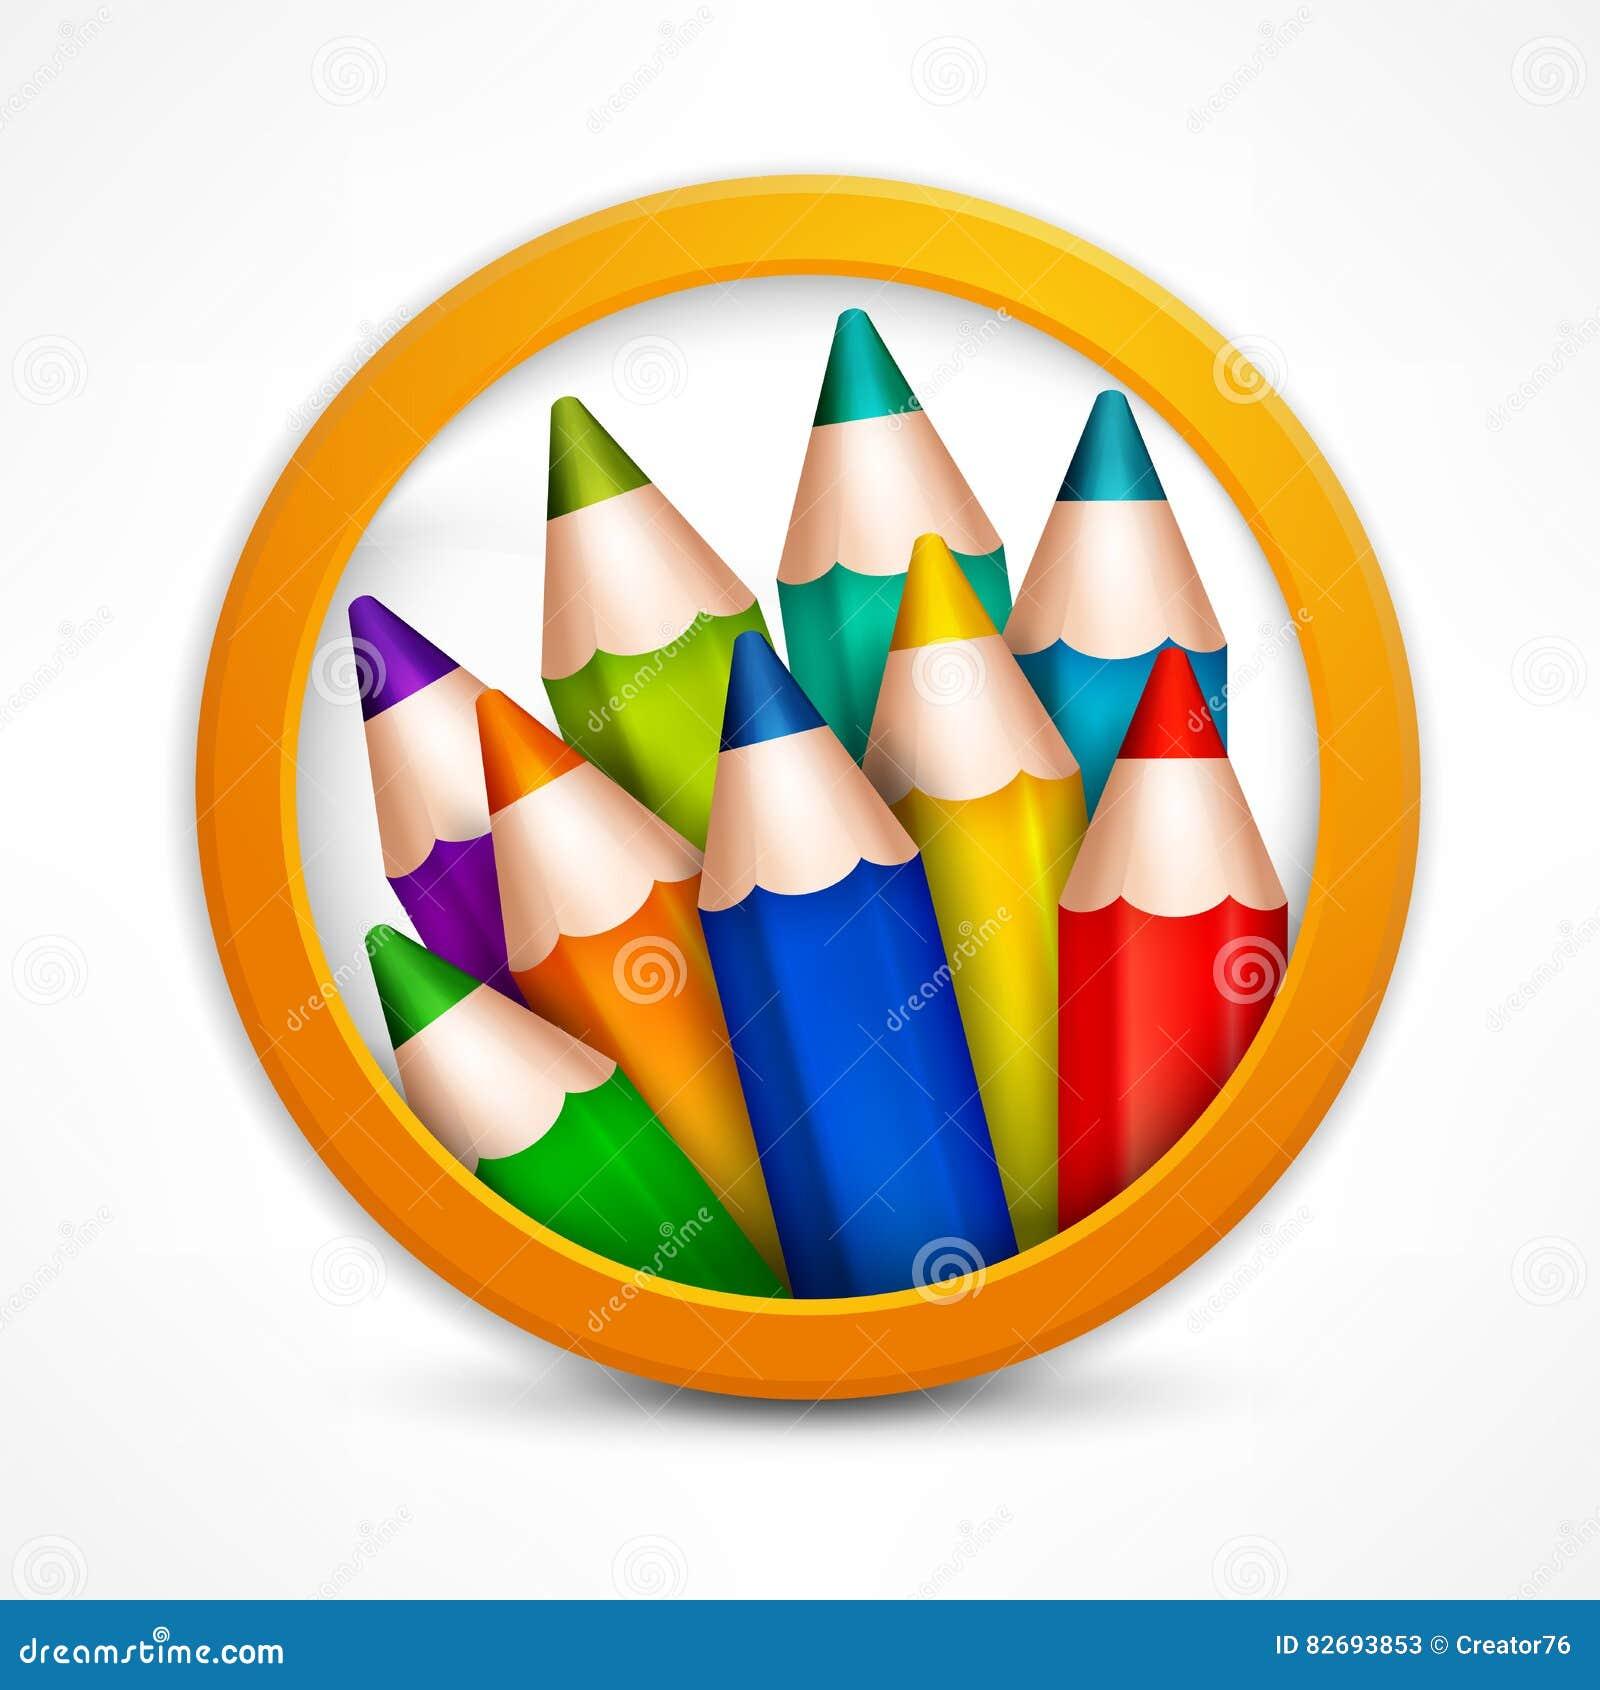 Circle pencil logo